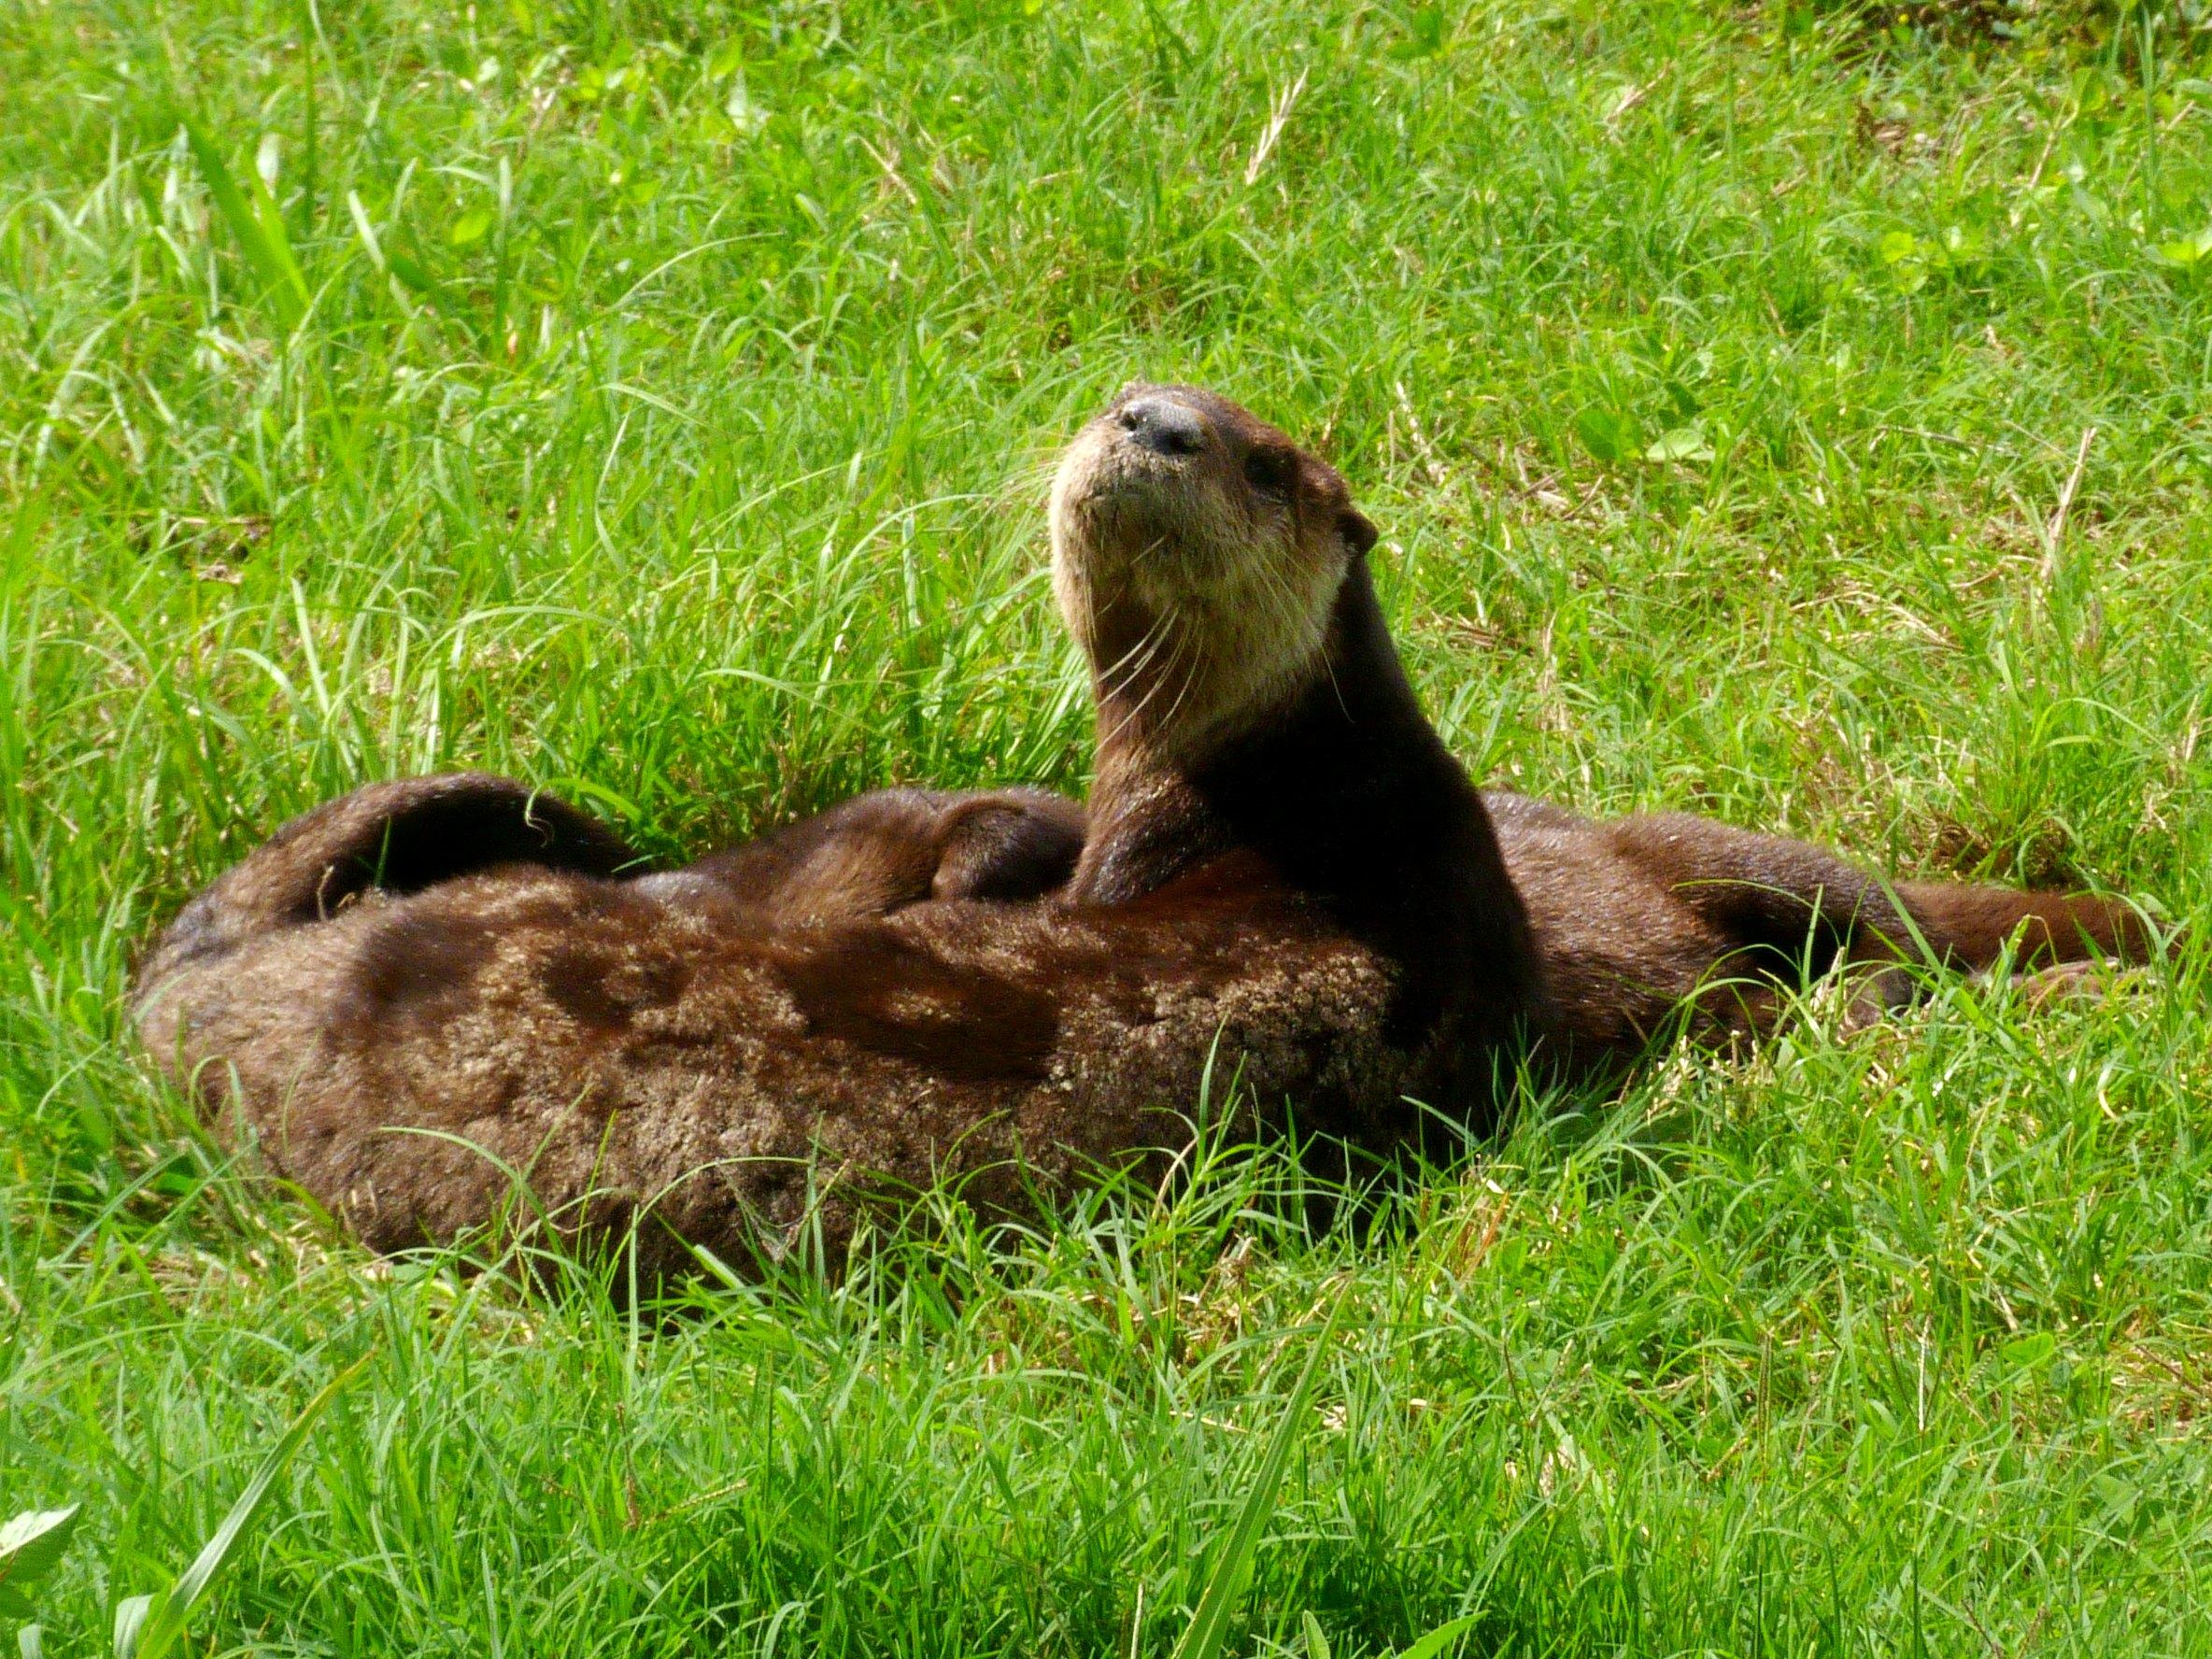 Sharp-Eared Mother Otter Hears the Photographer's Shutter Close